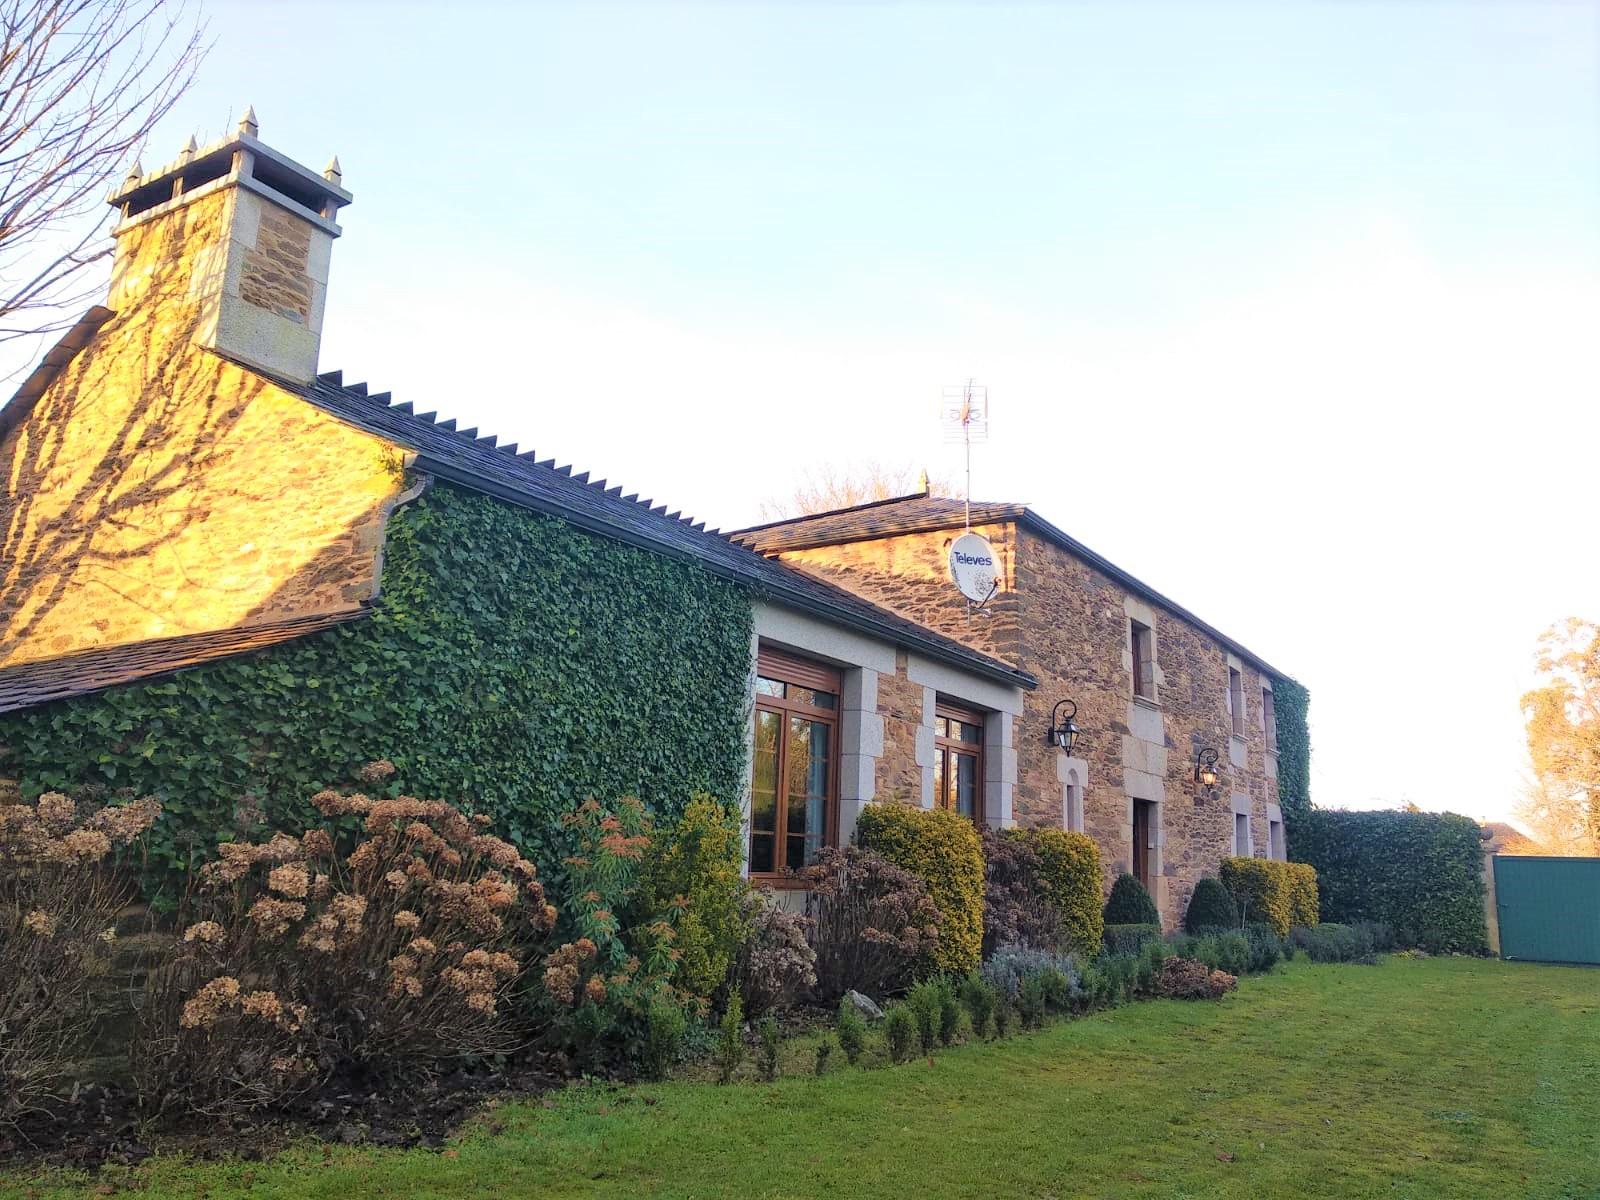 Espectacular casa de piedra – en Cospeito (Lugo)